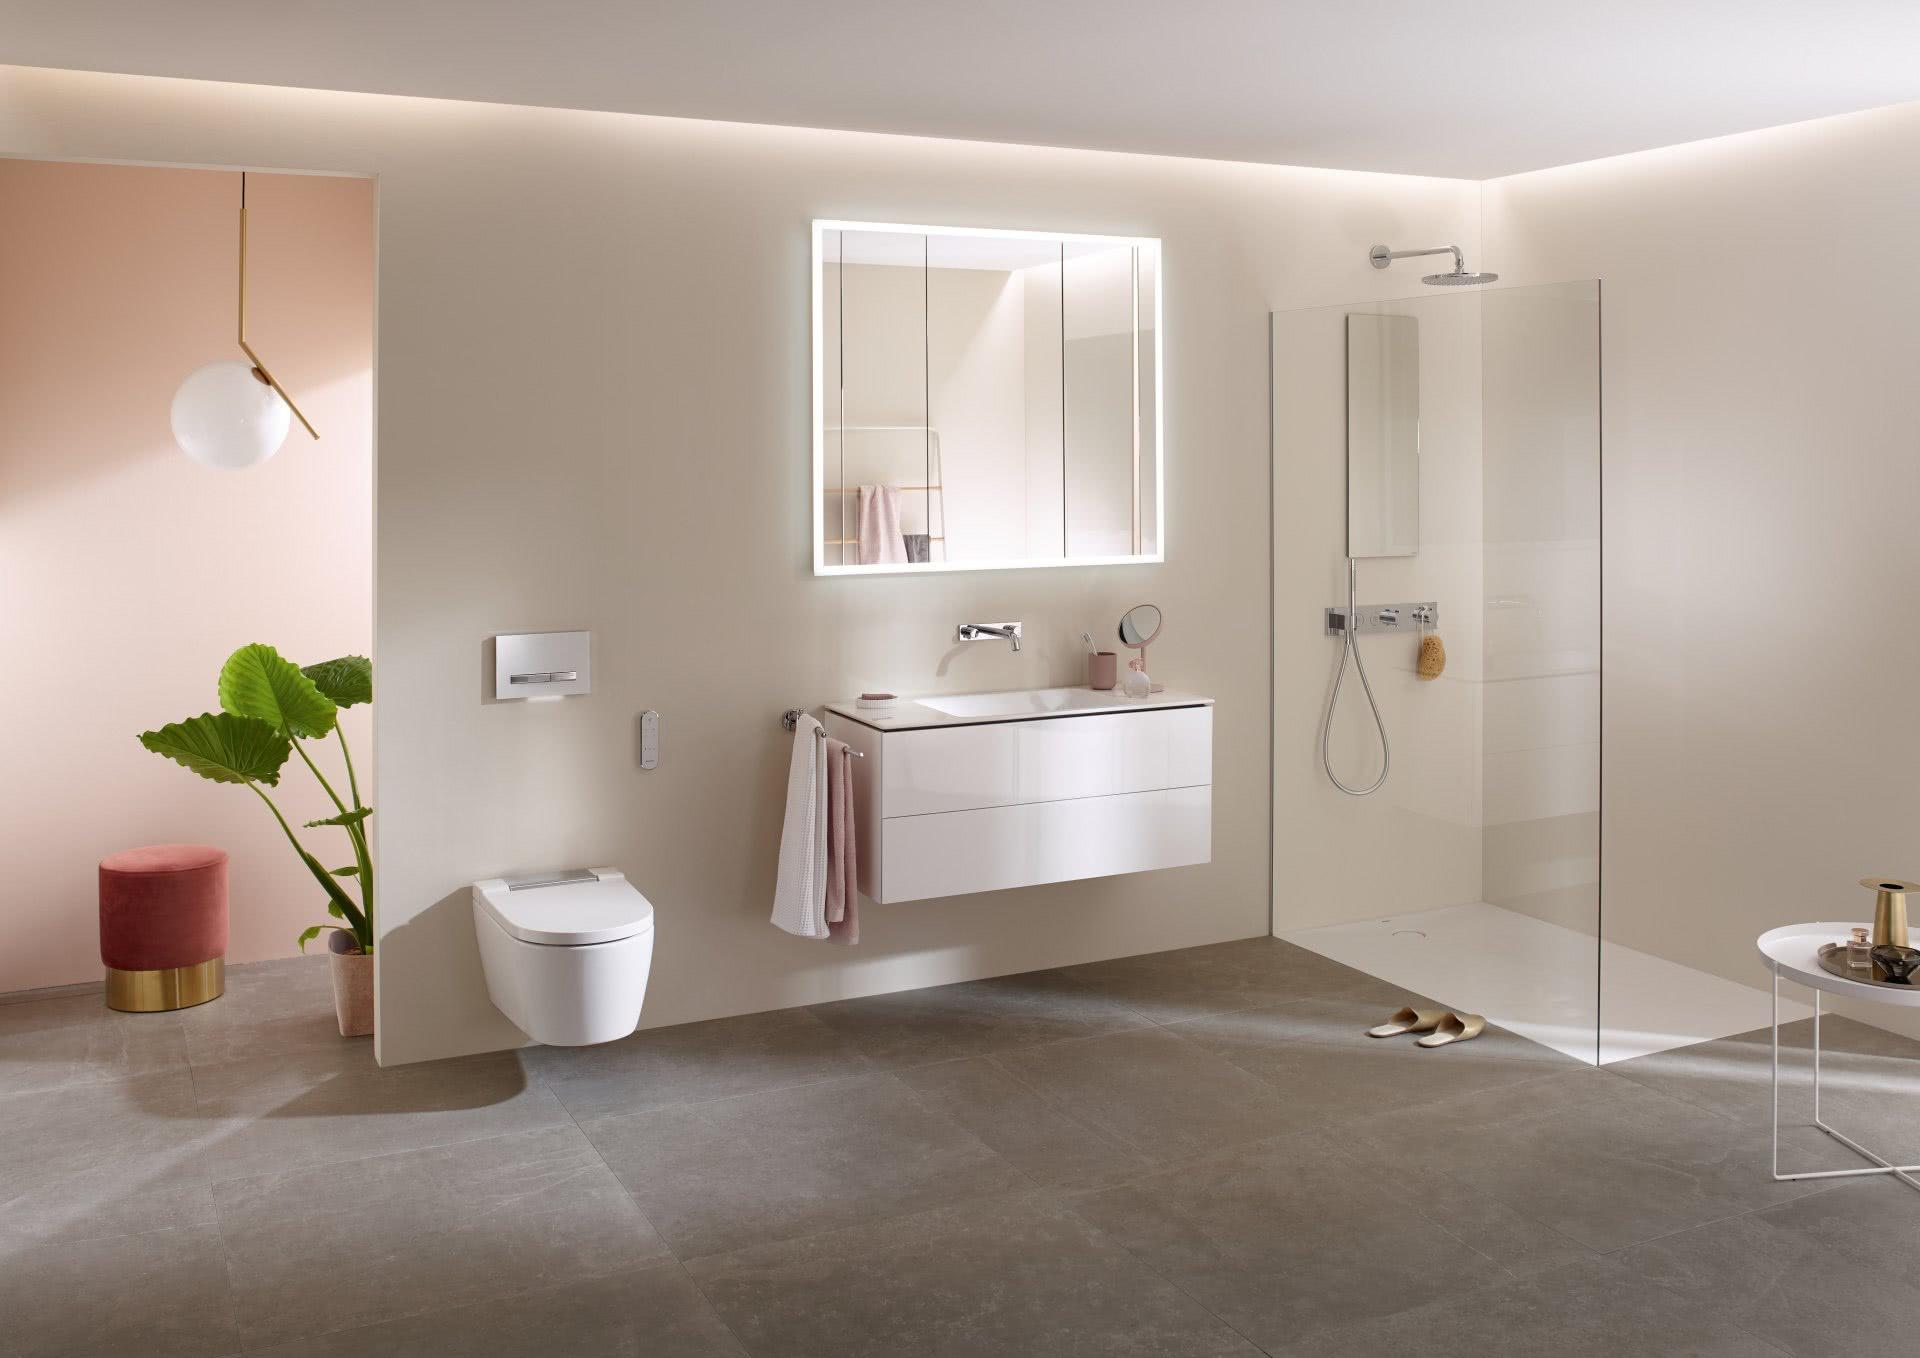 BadeWelten   Badgestaltung   moderne Badezimmer   neues Bad